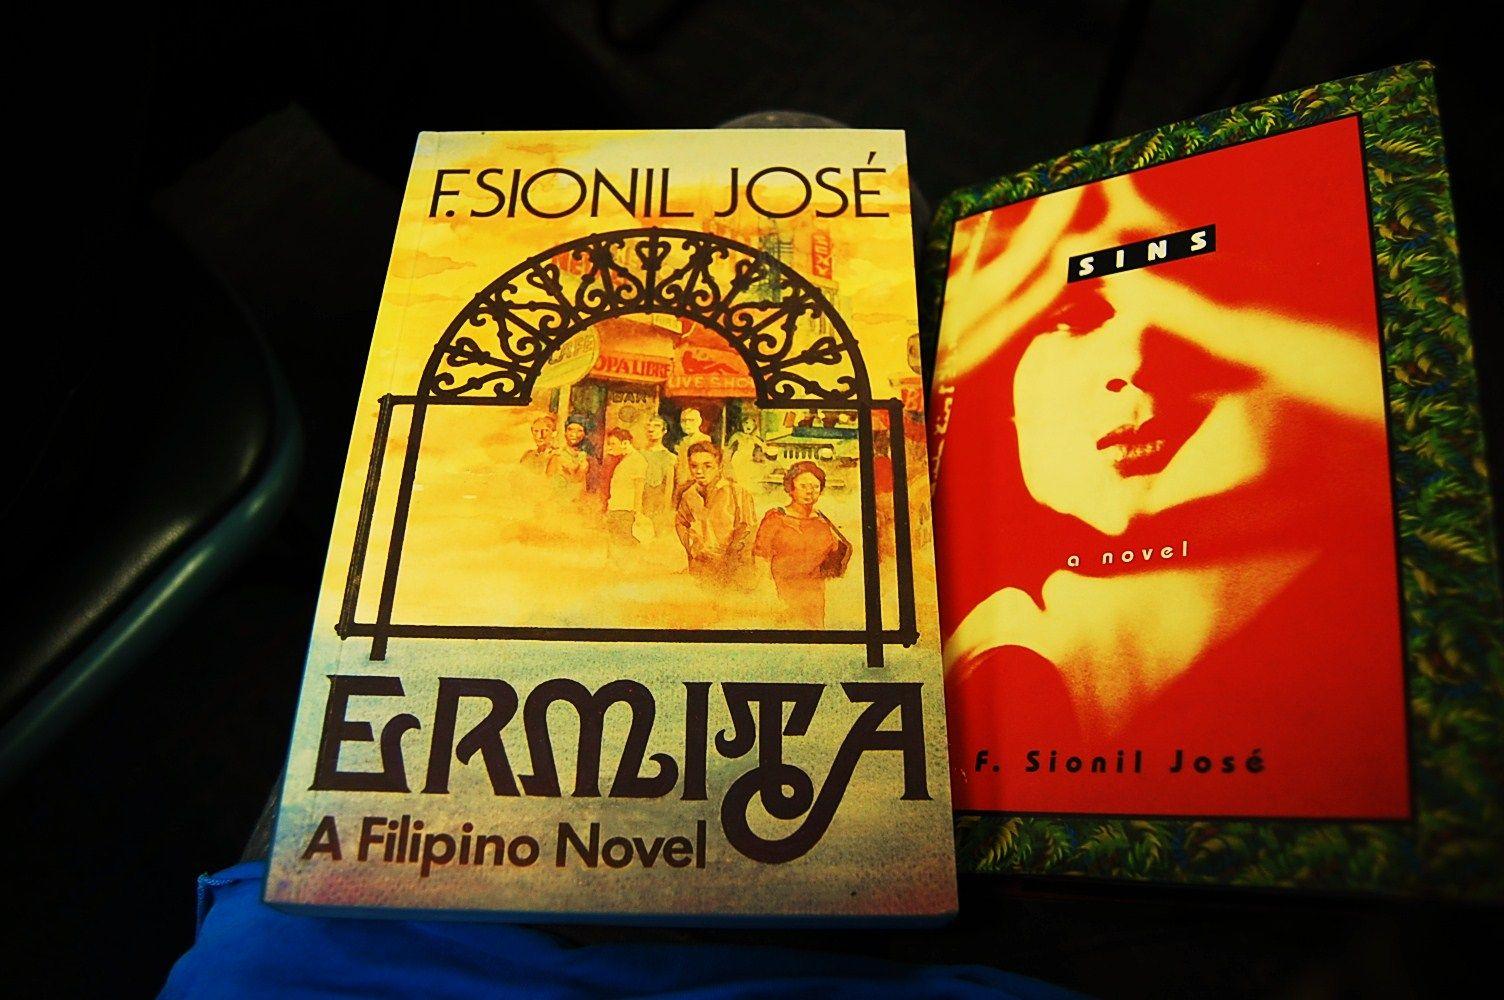 books by F. Sionil Jose, Filipino National Artist. His